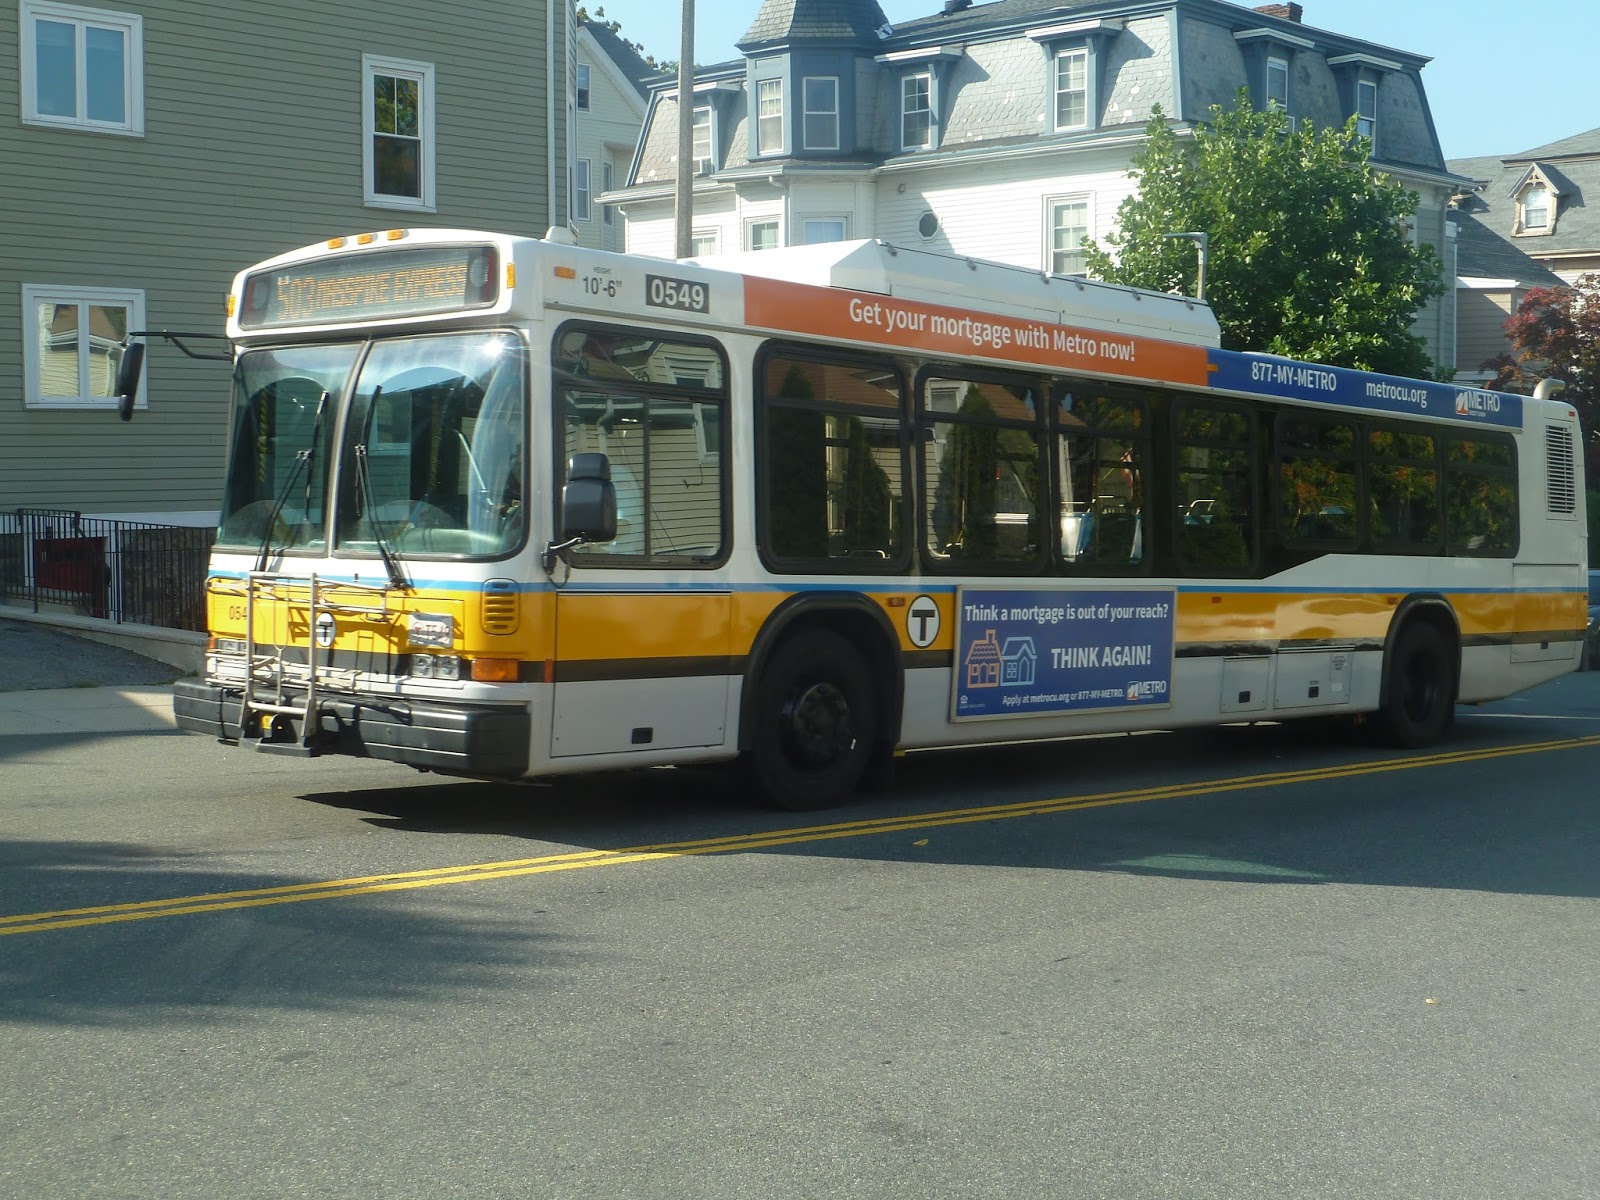 Miles On The Mbta 503 Express Bus Brighton Center